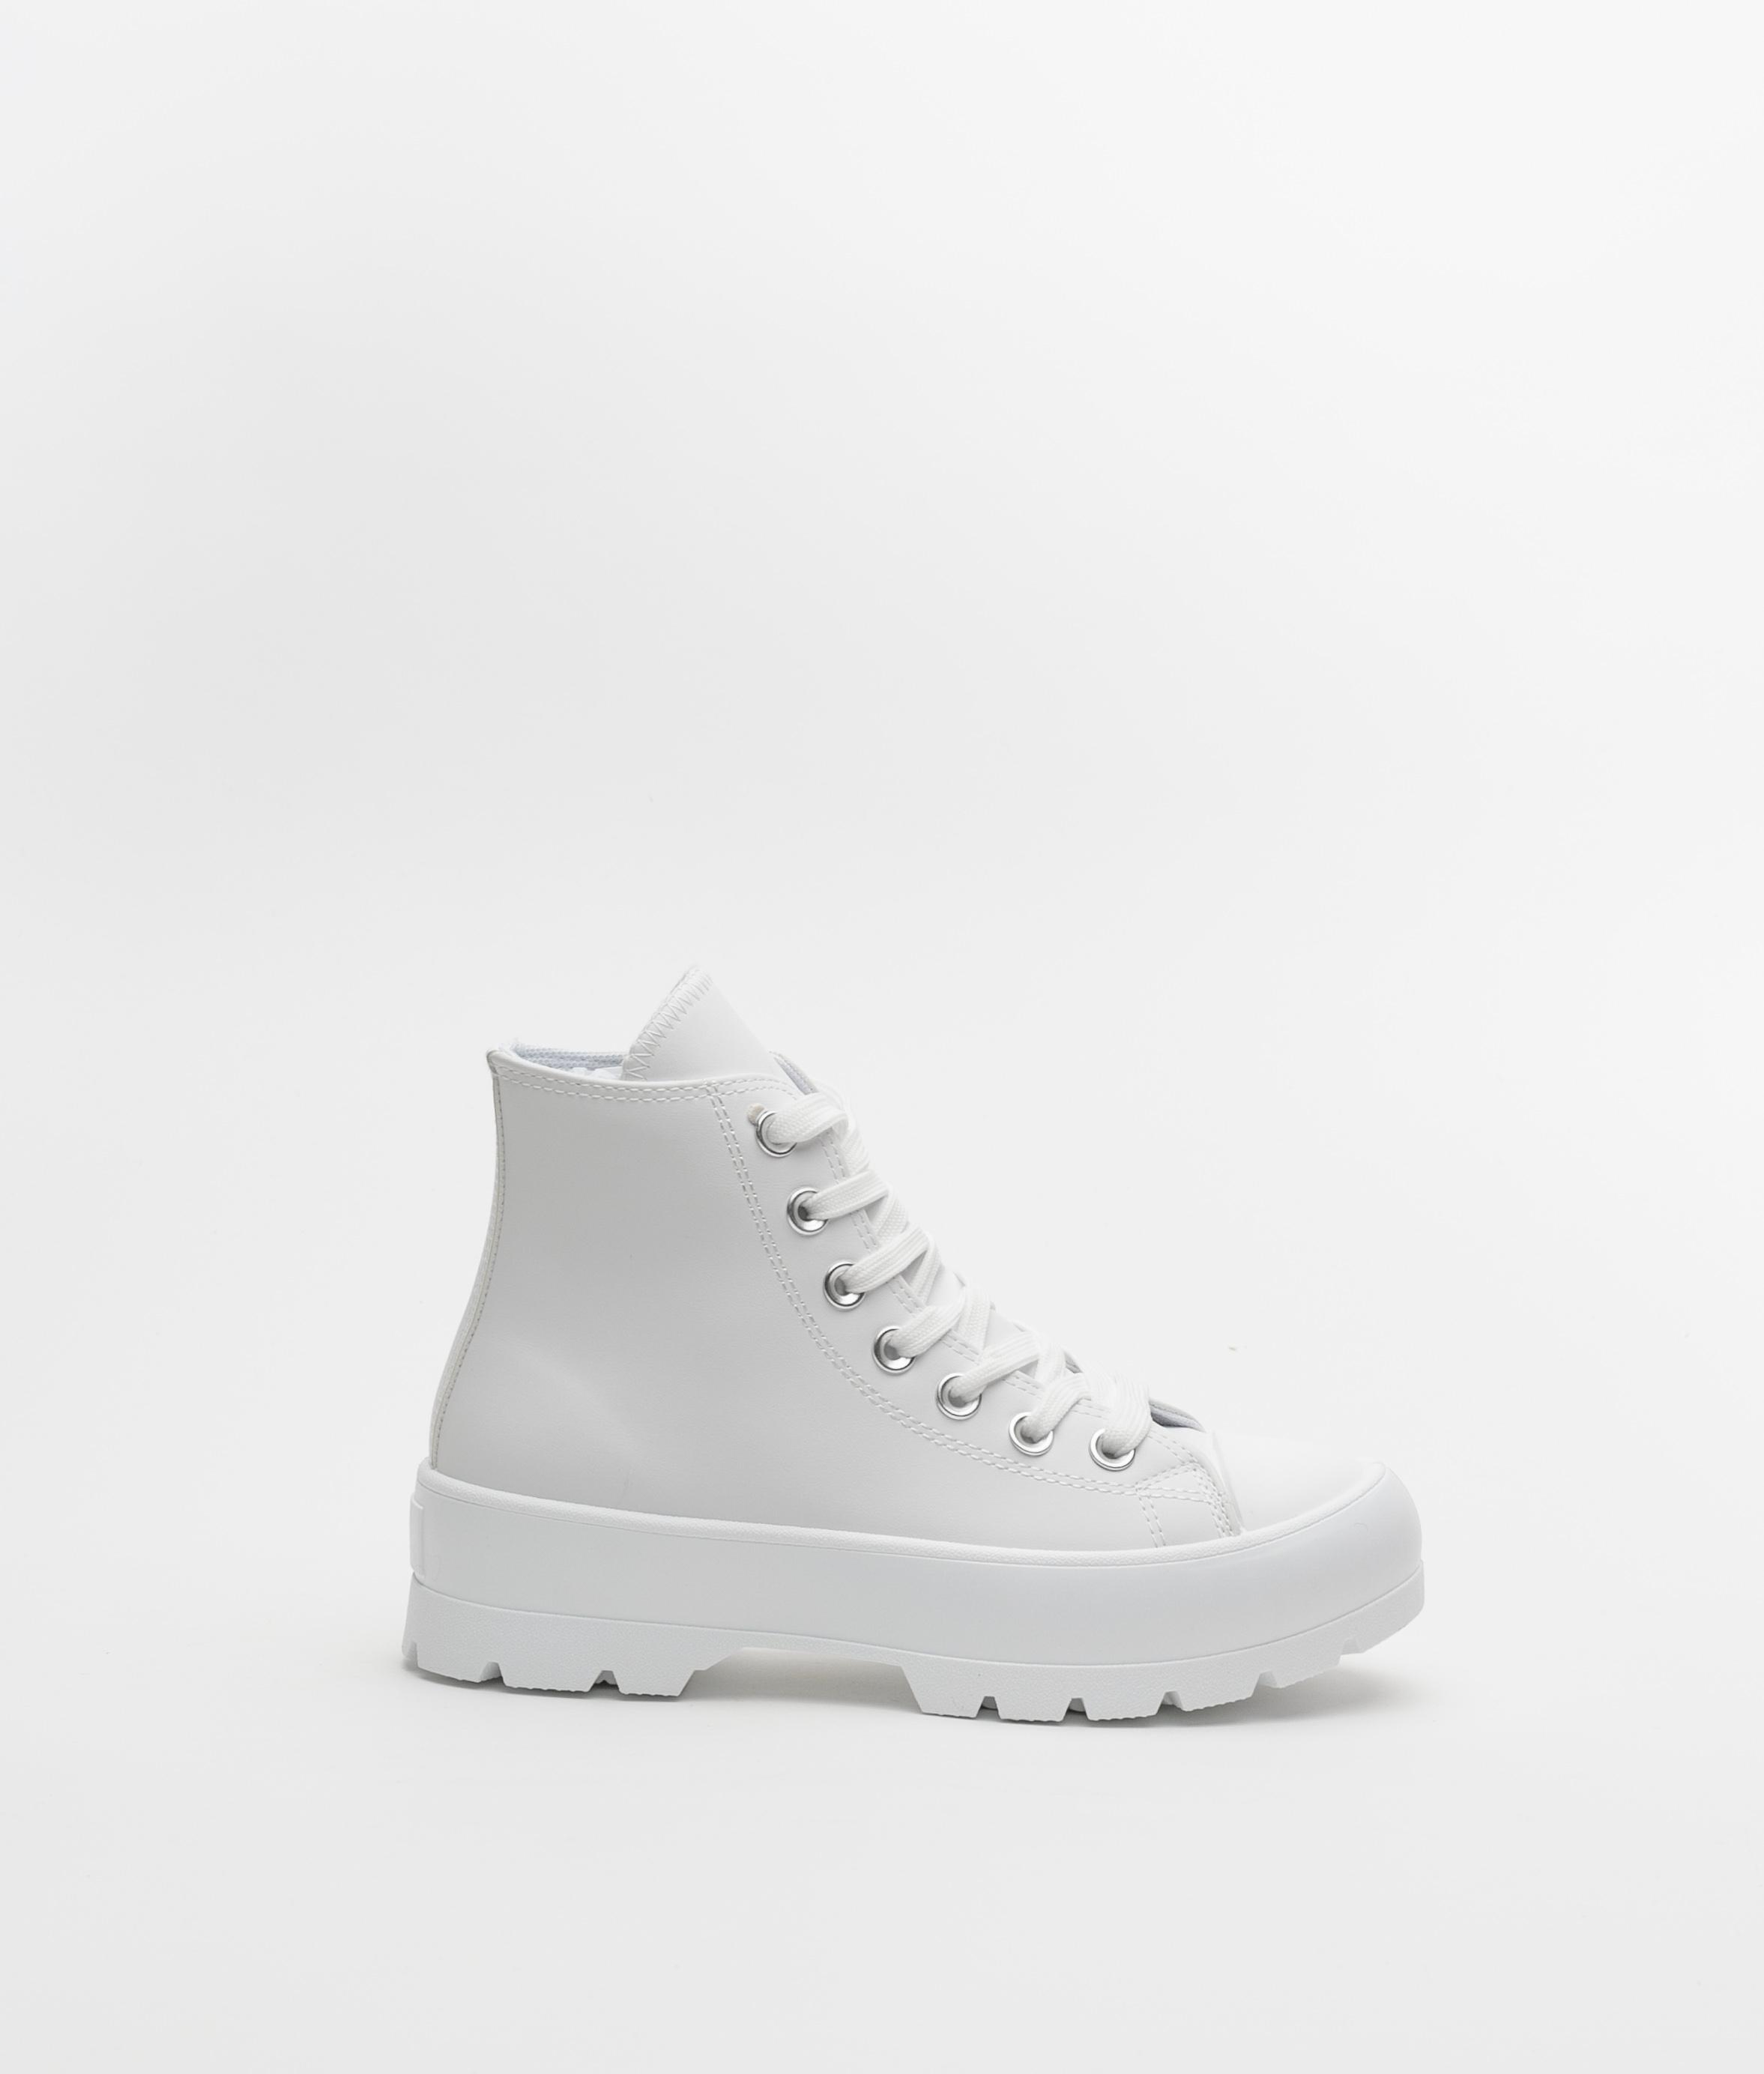 Sneakers Ludi - Blanco Polipiel